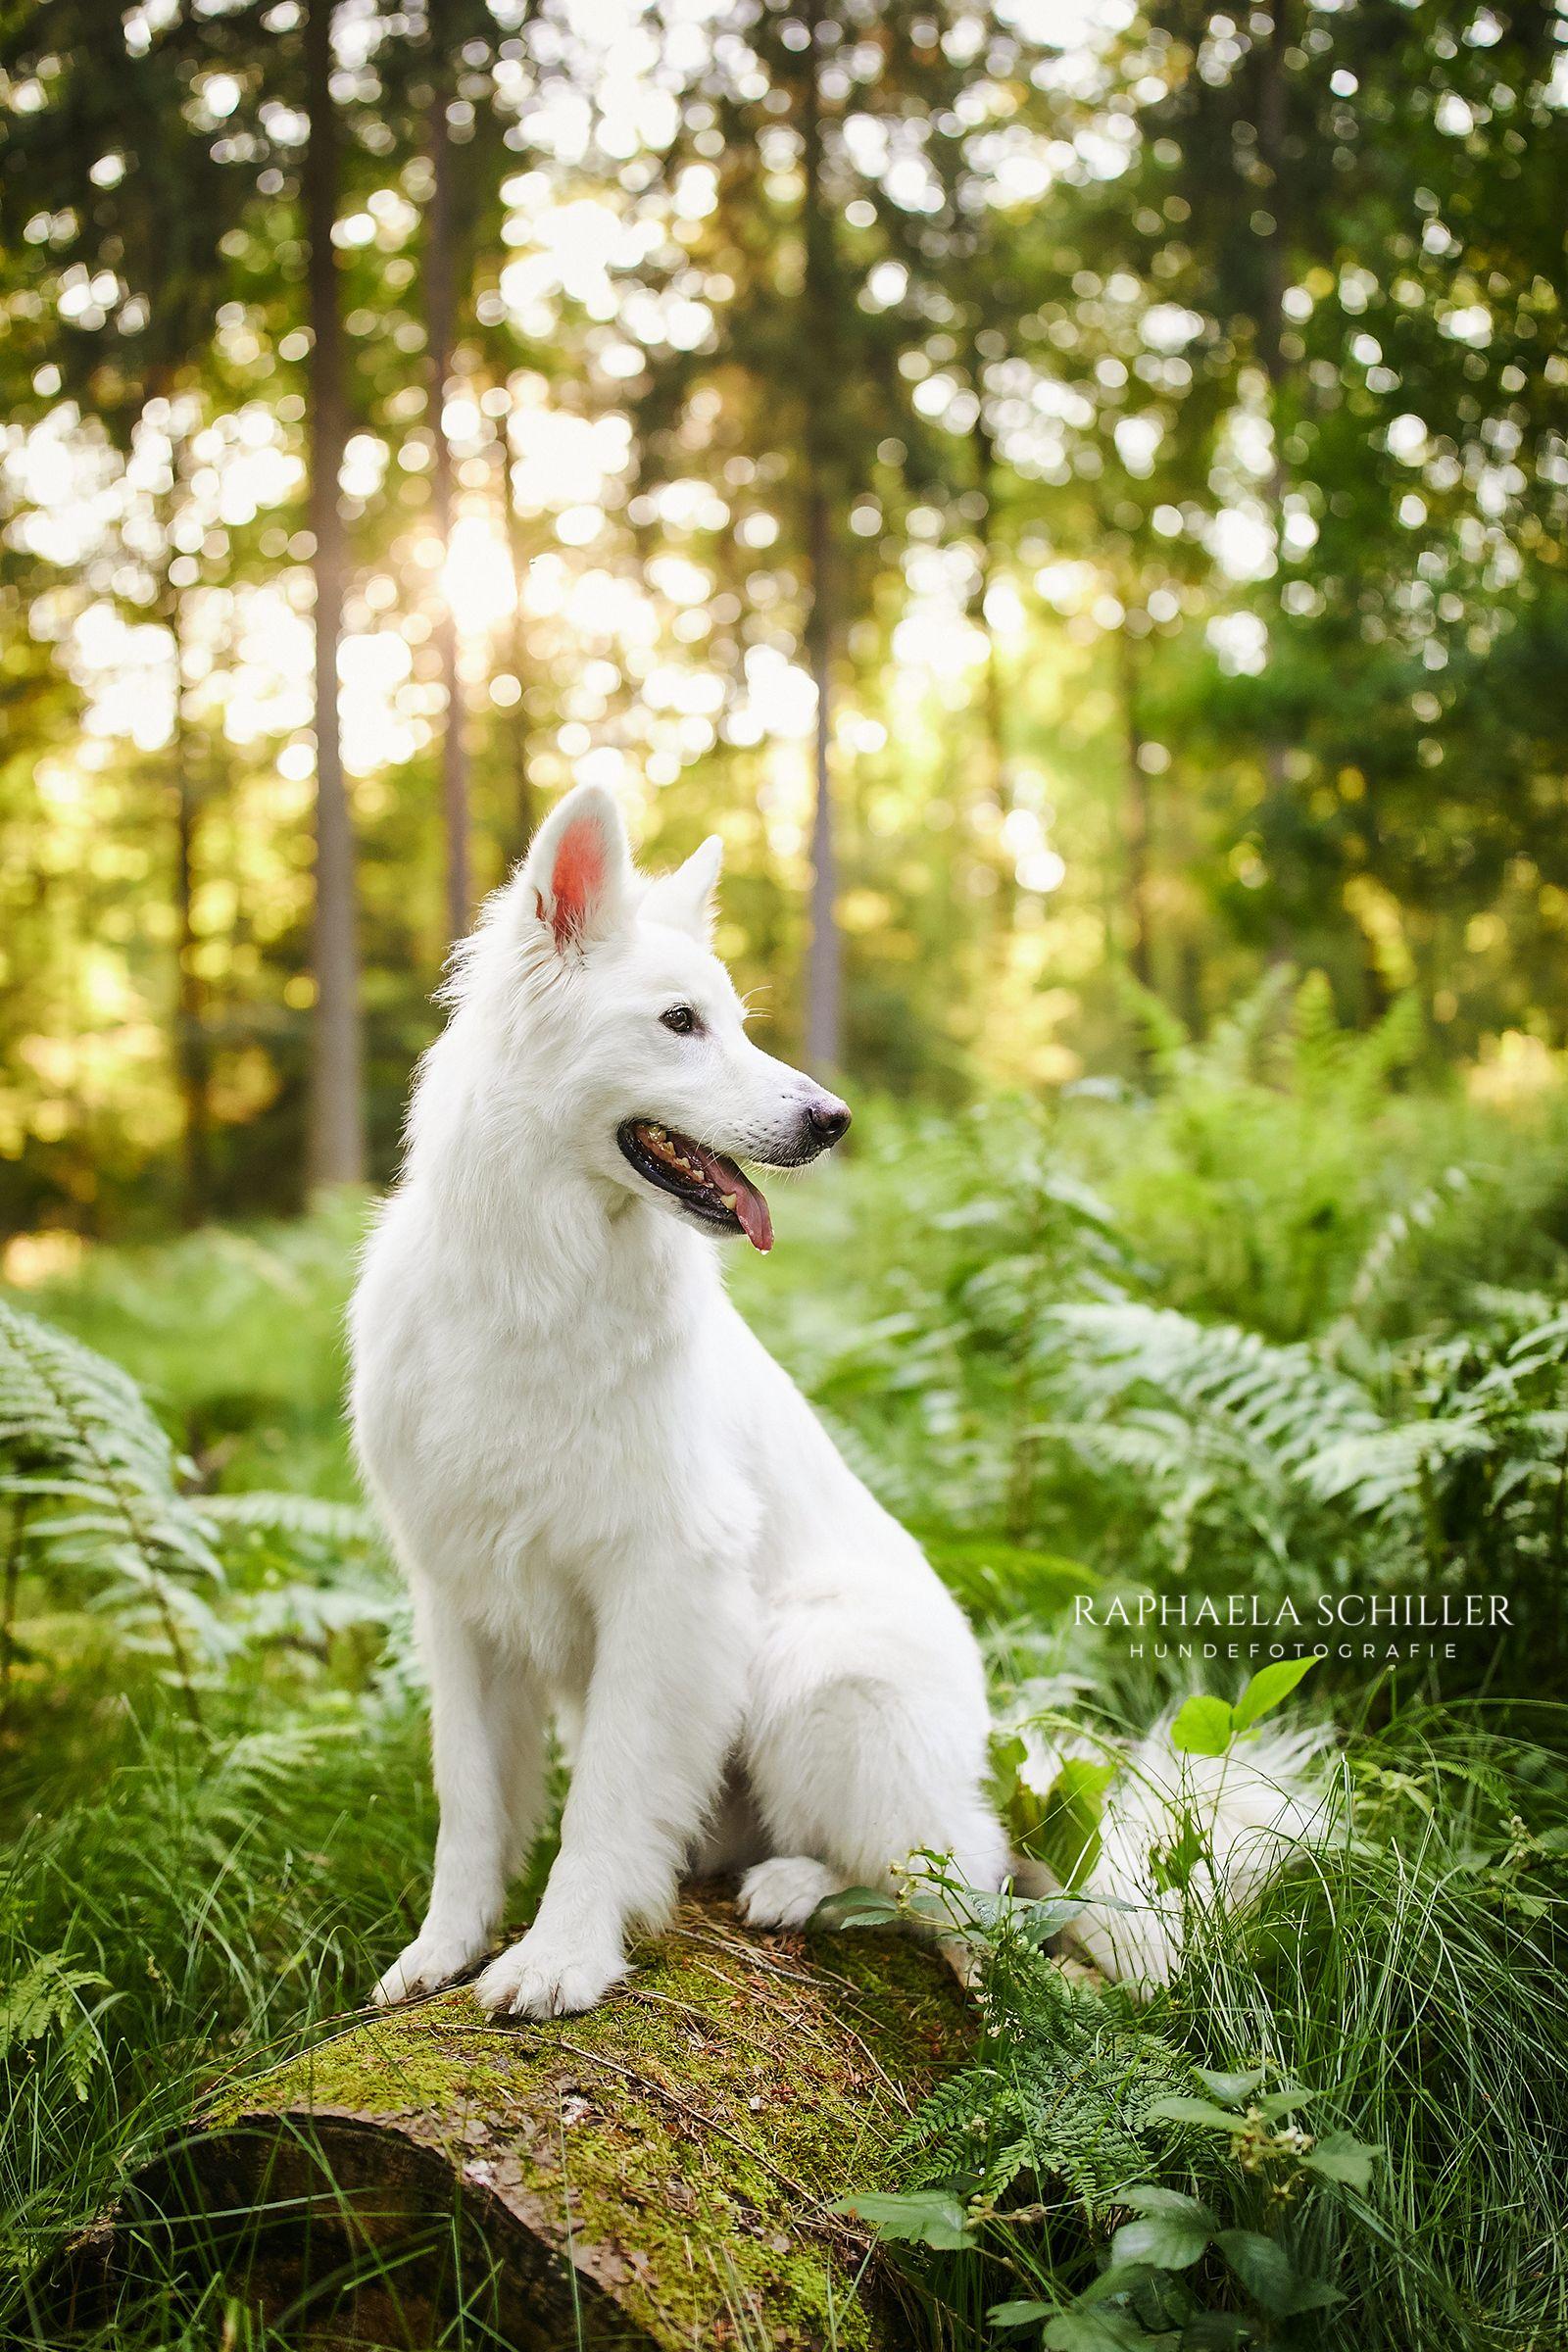 Pin Von Arizona Auf Wundervolle 4 Pfoten Hundefotografie Hunde Hunde Fotos